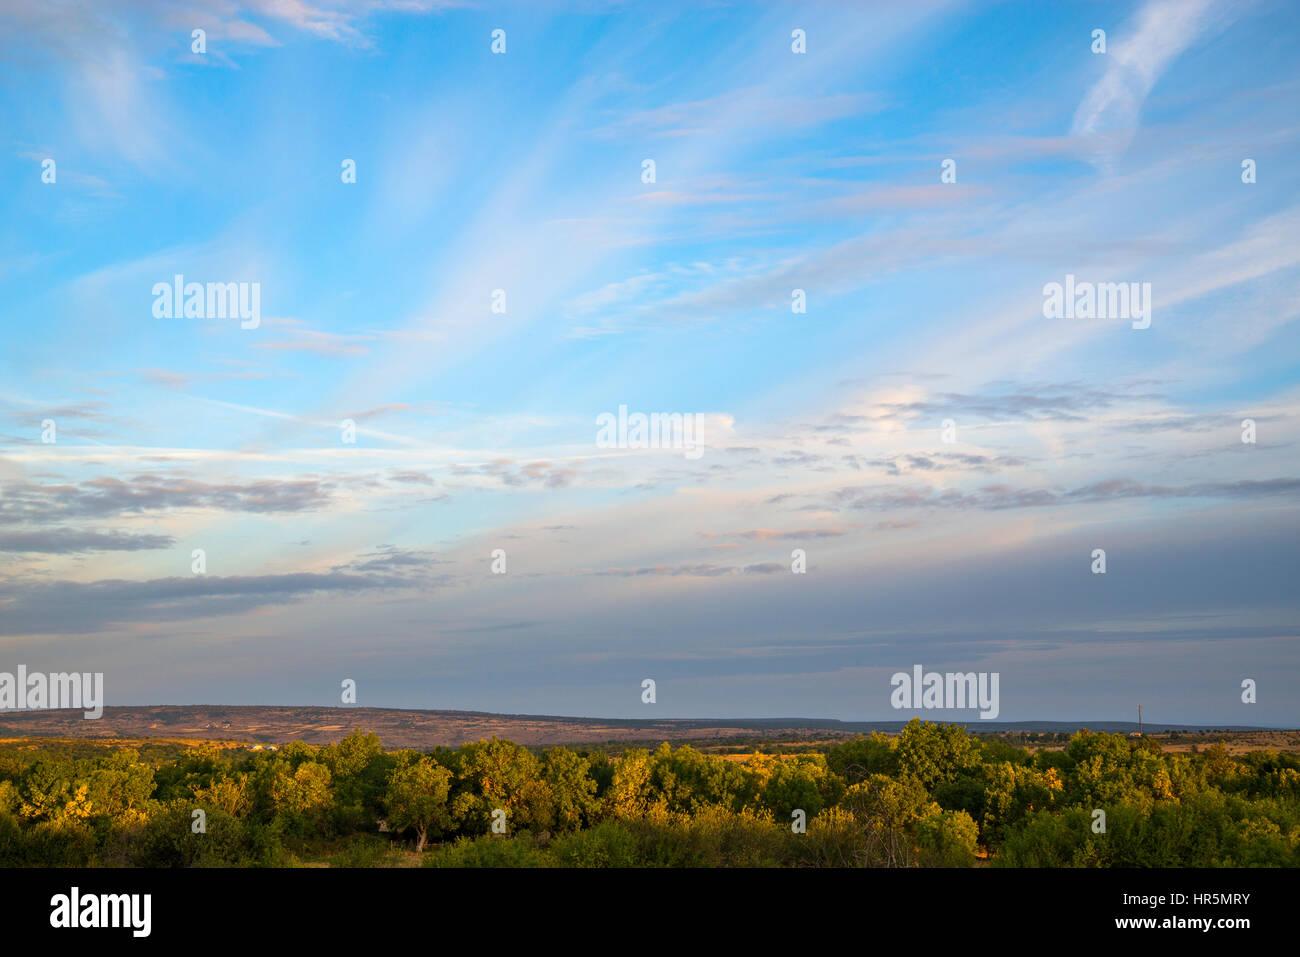 Sky and landscape. Segovia province, Castilla Leon, Spain. - Stock Image